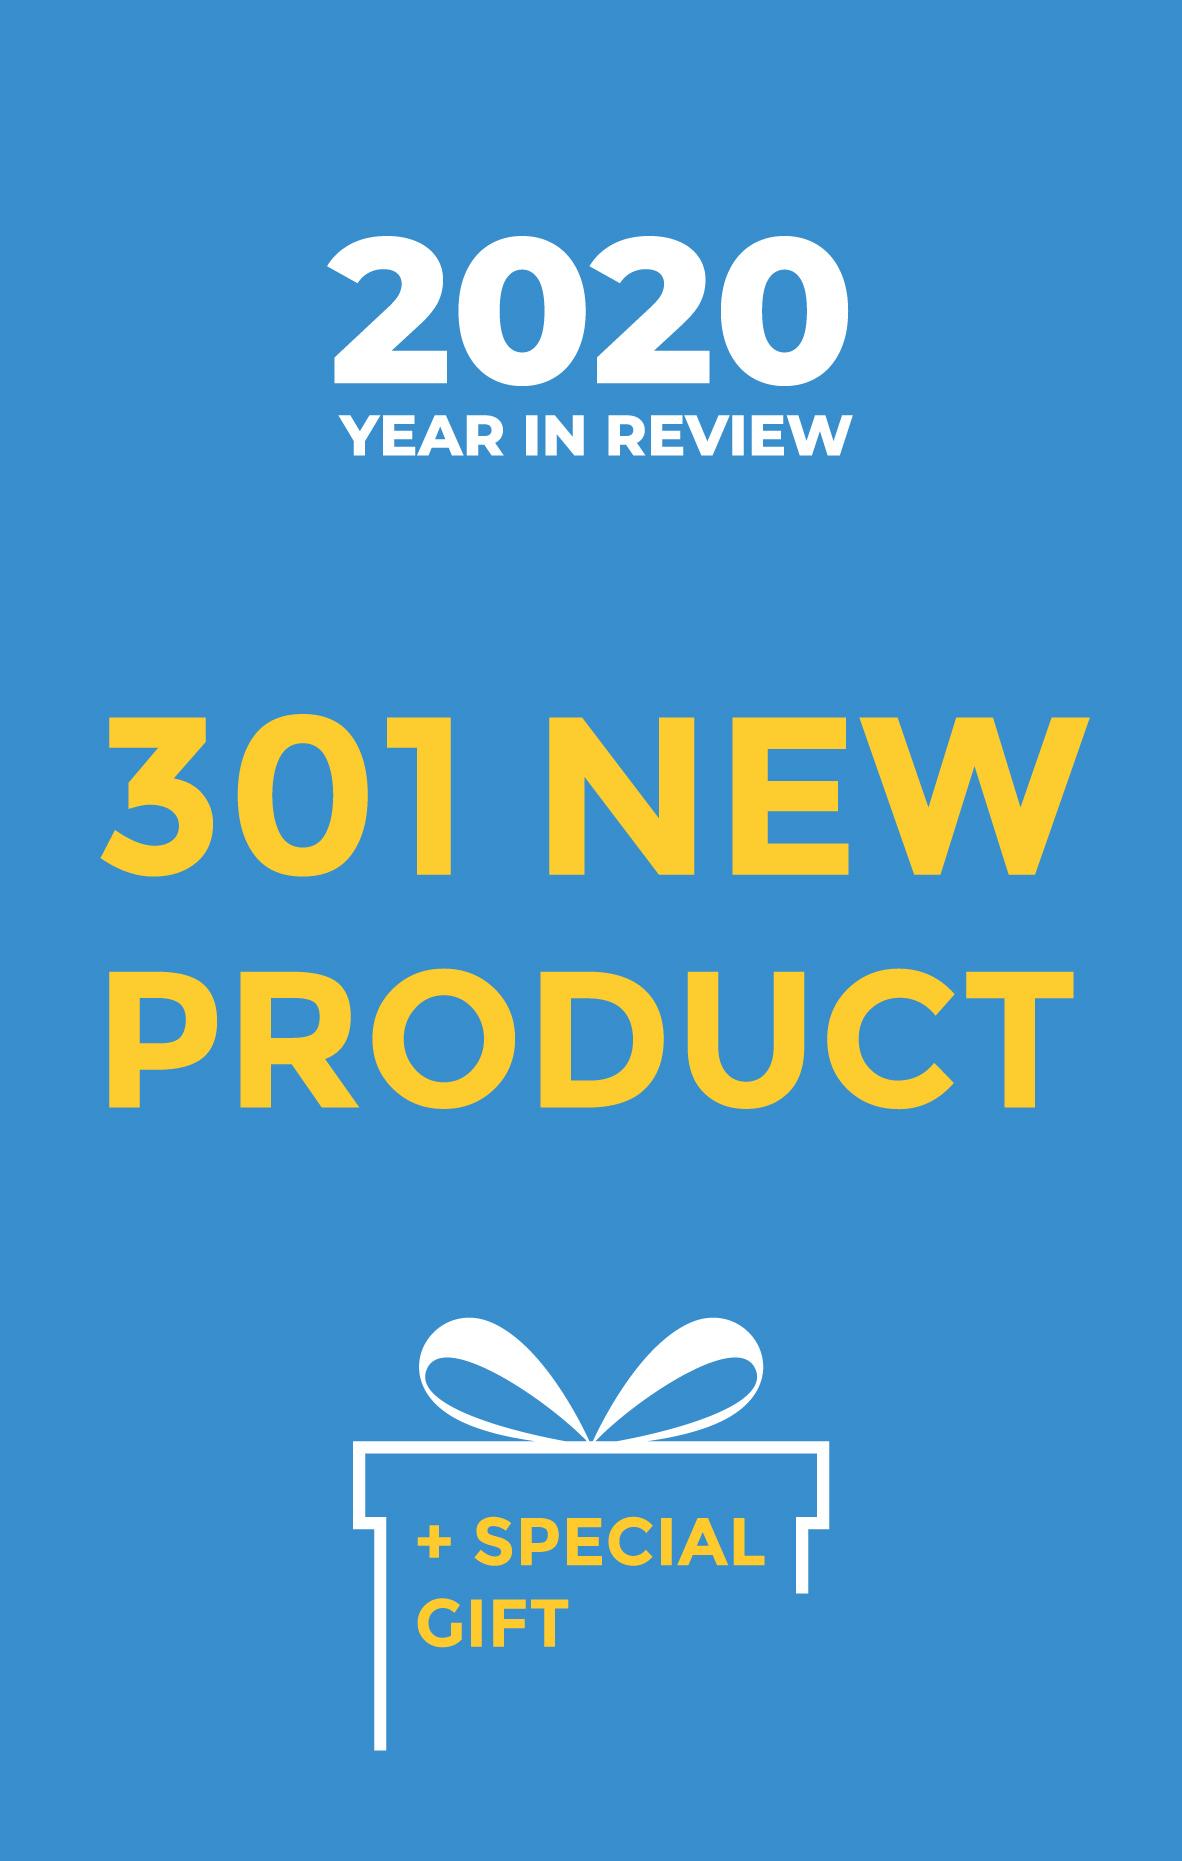 2020 recap 301 new product